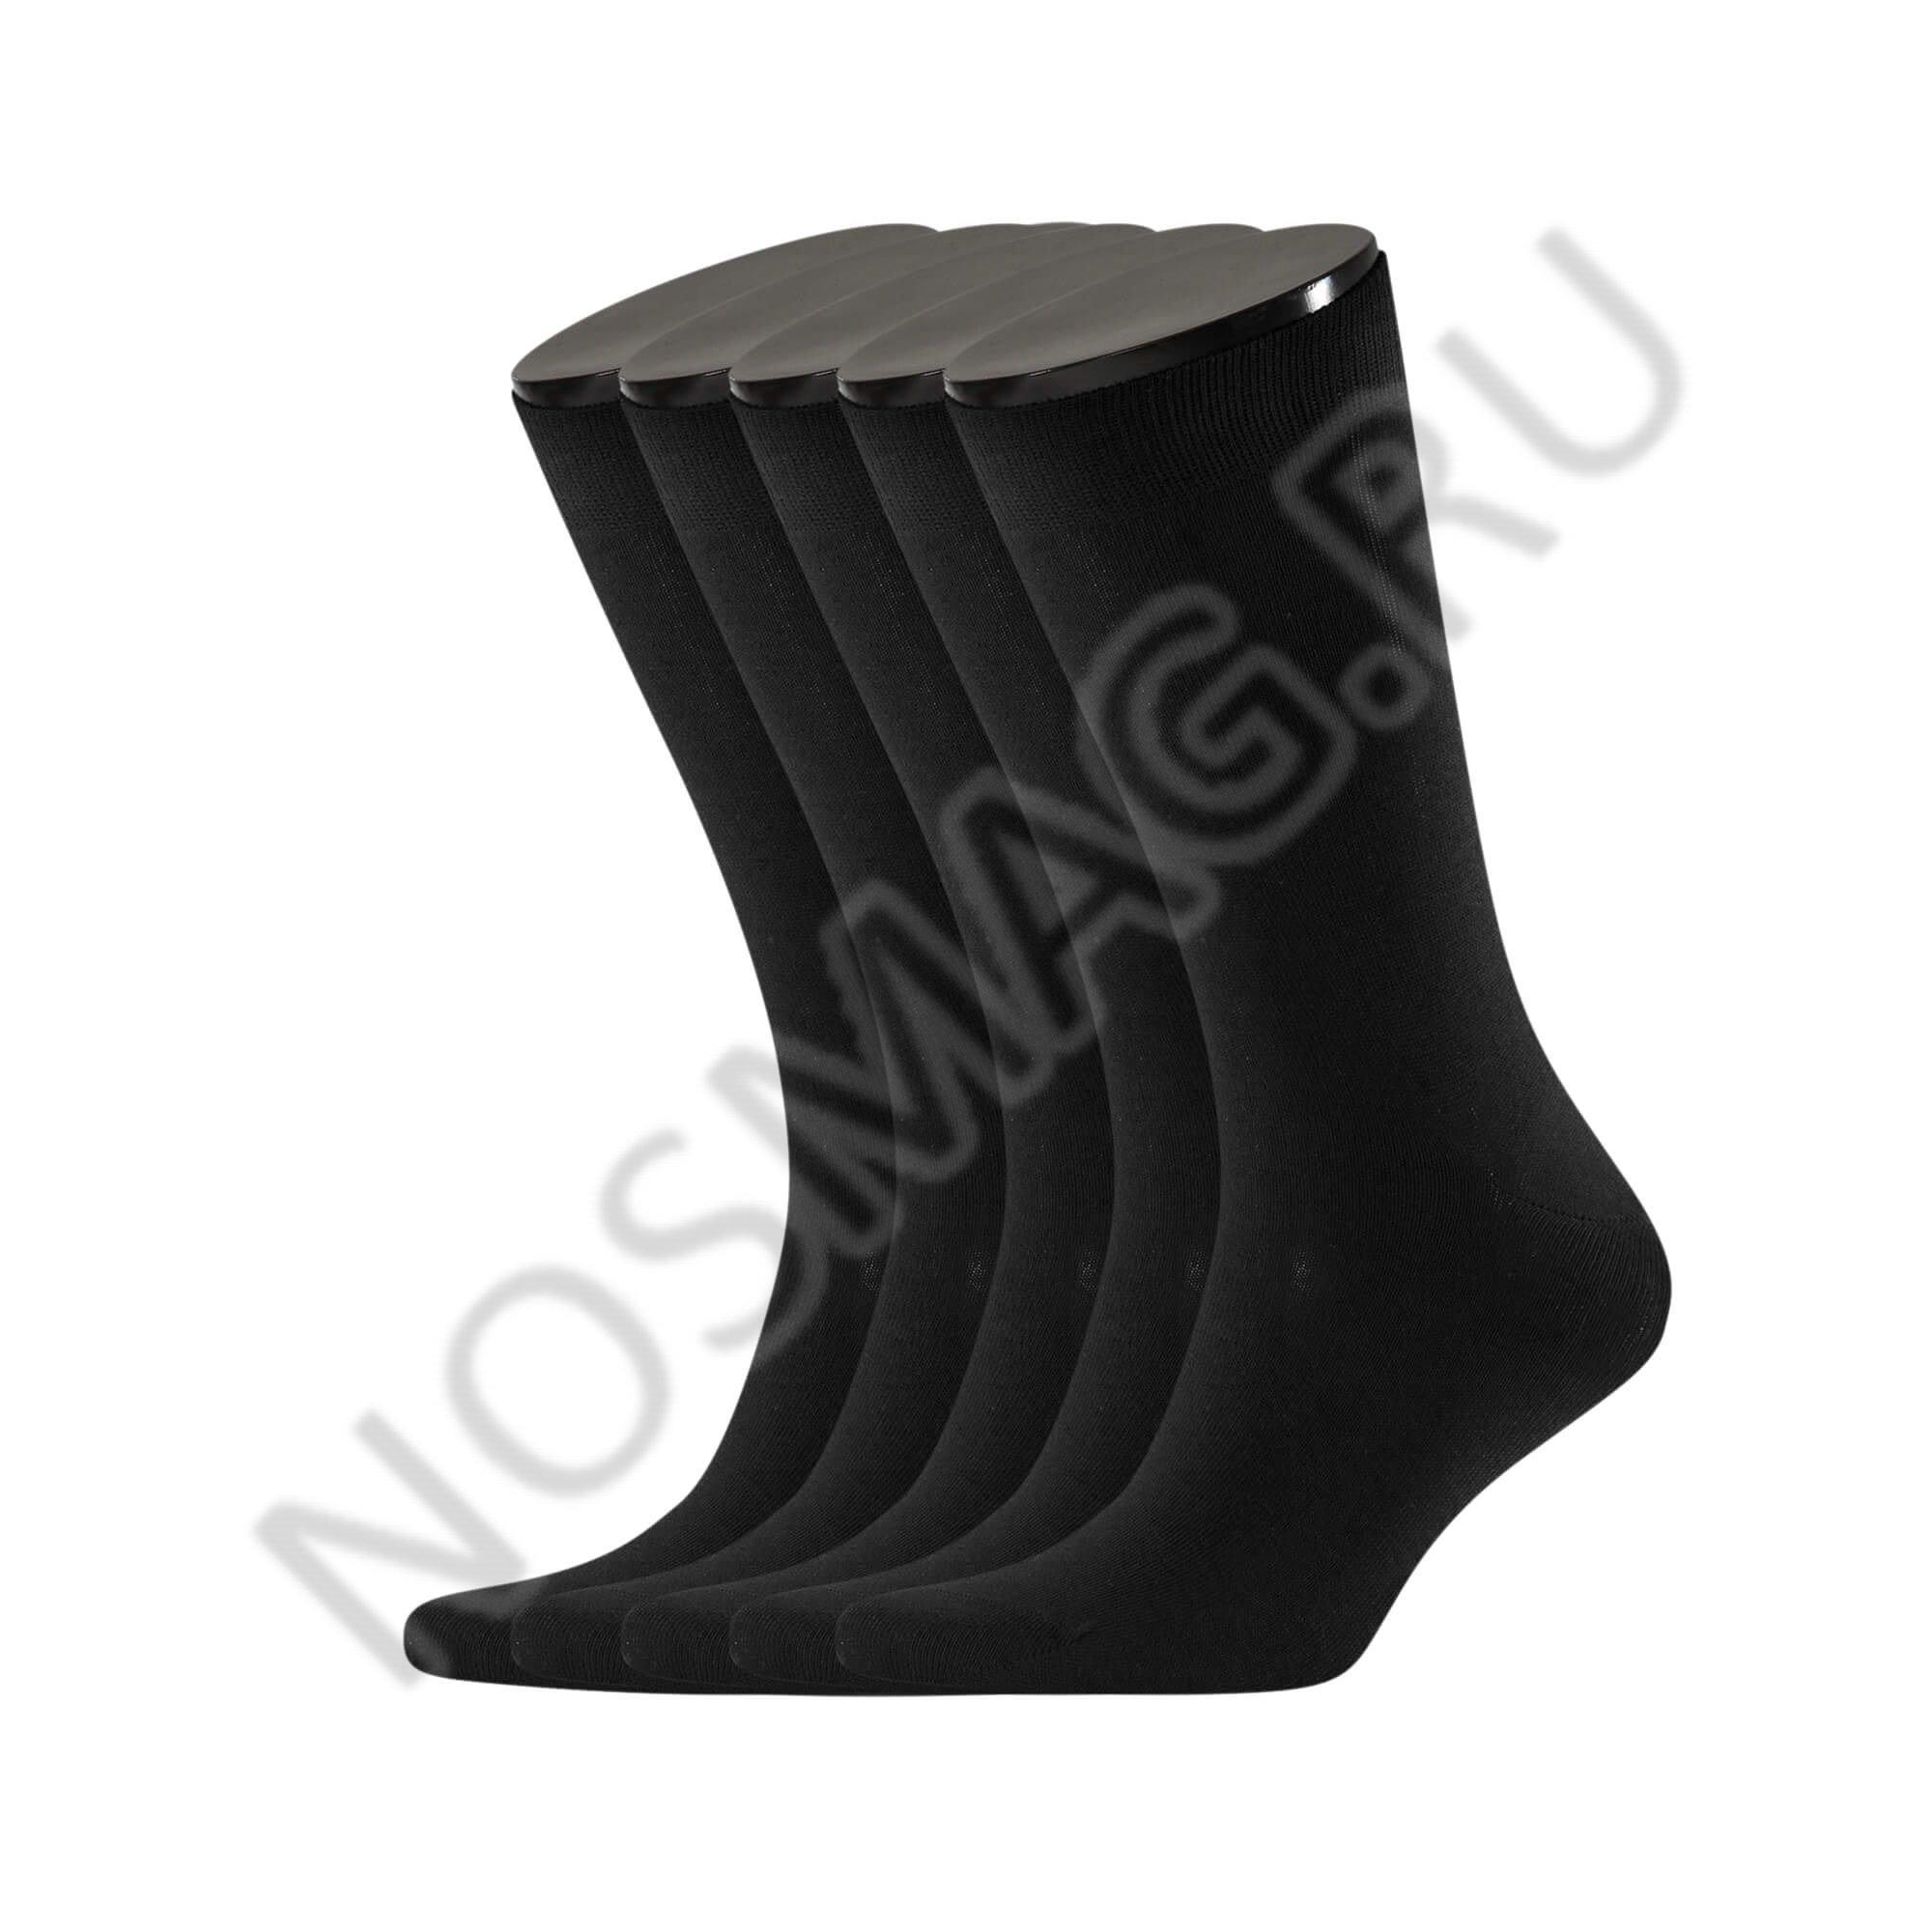 Комплект мужских носков Teller Optima из 5 пар